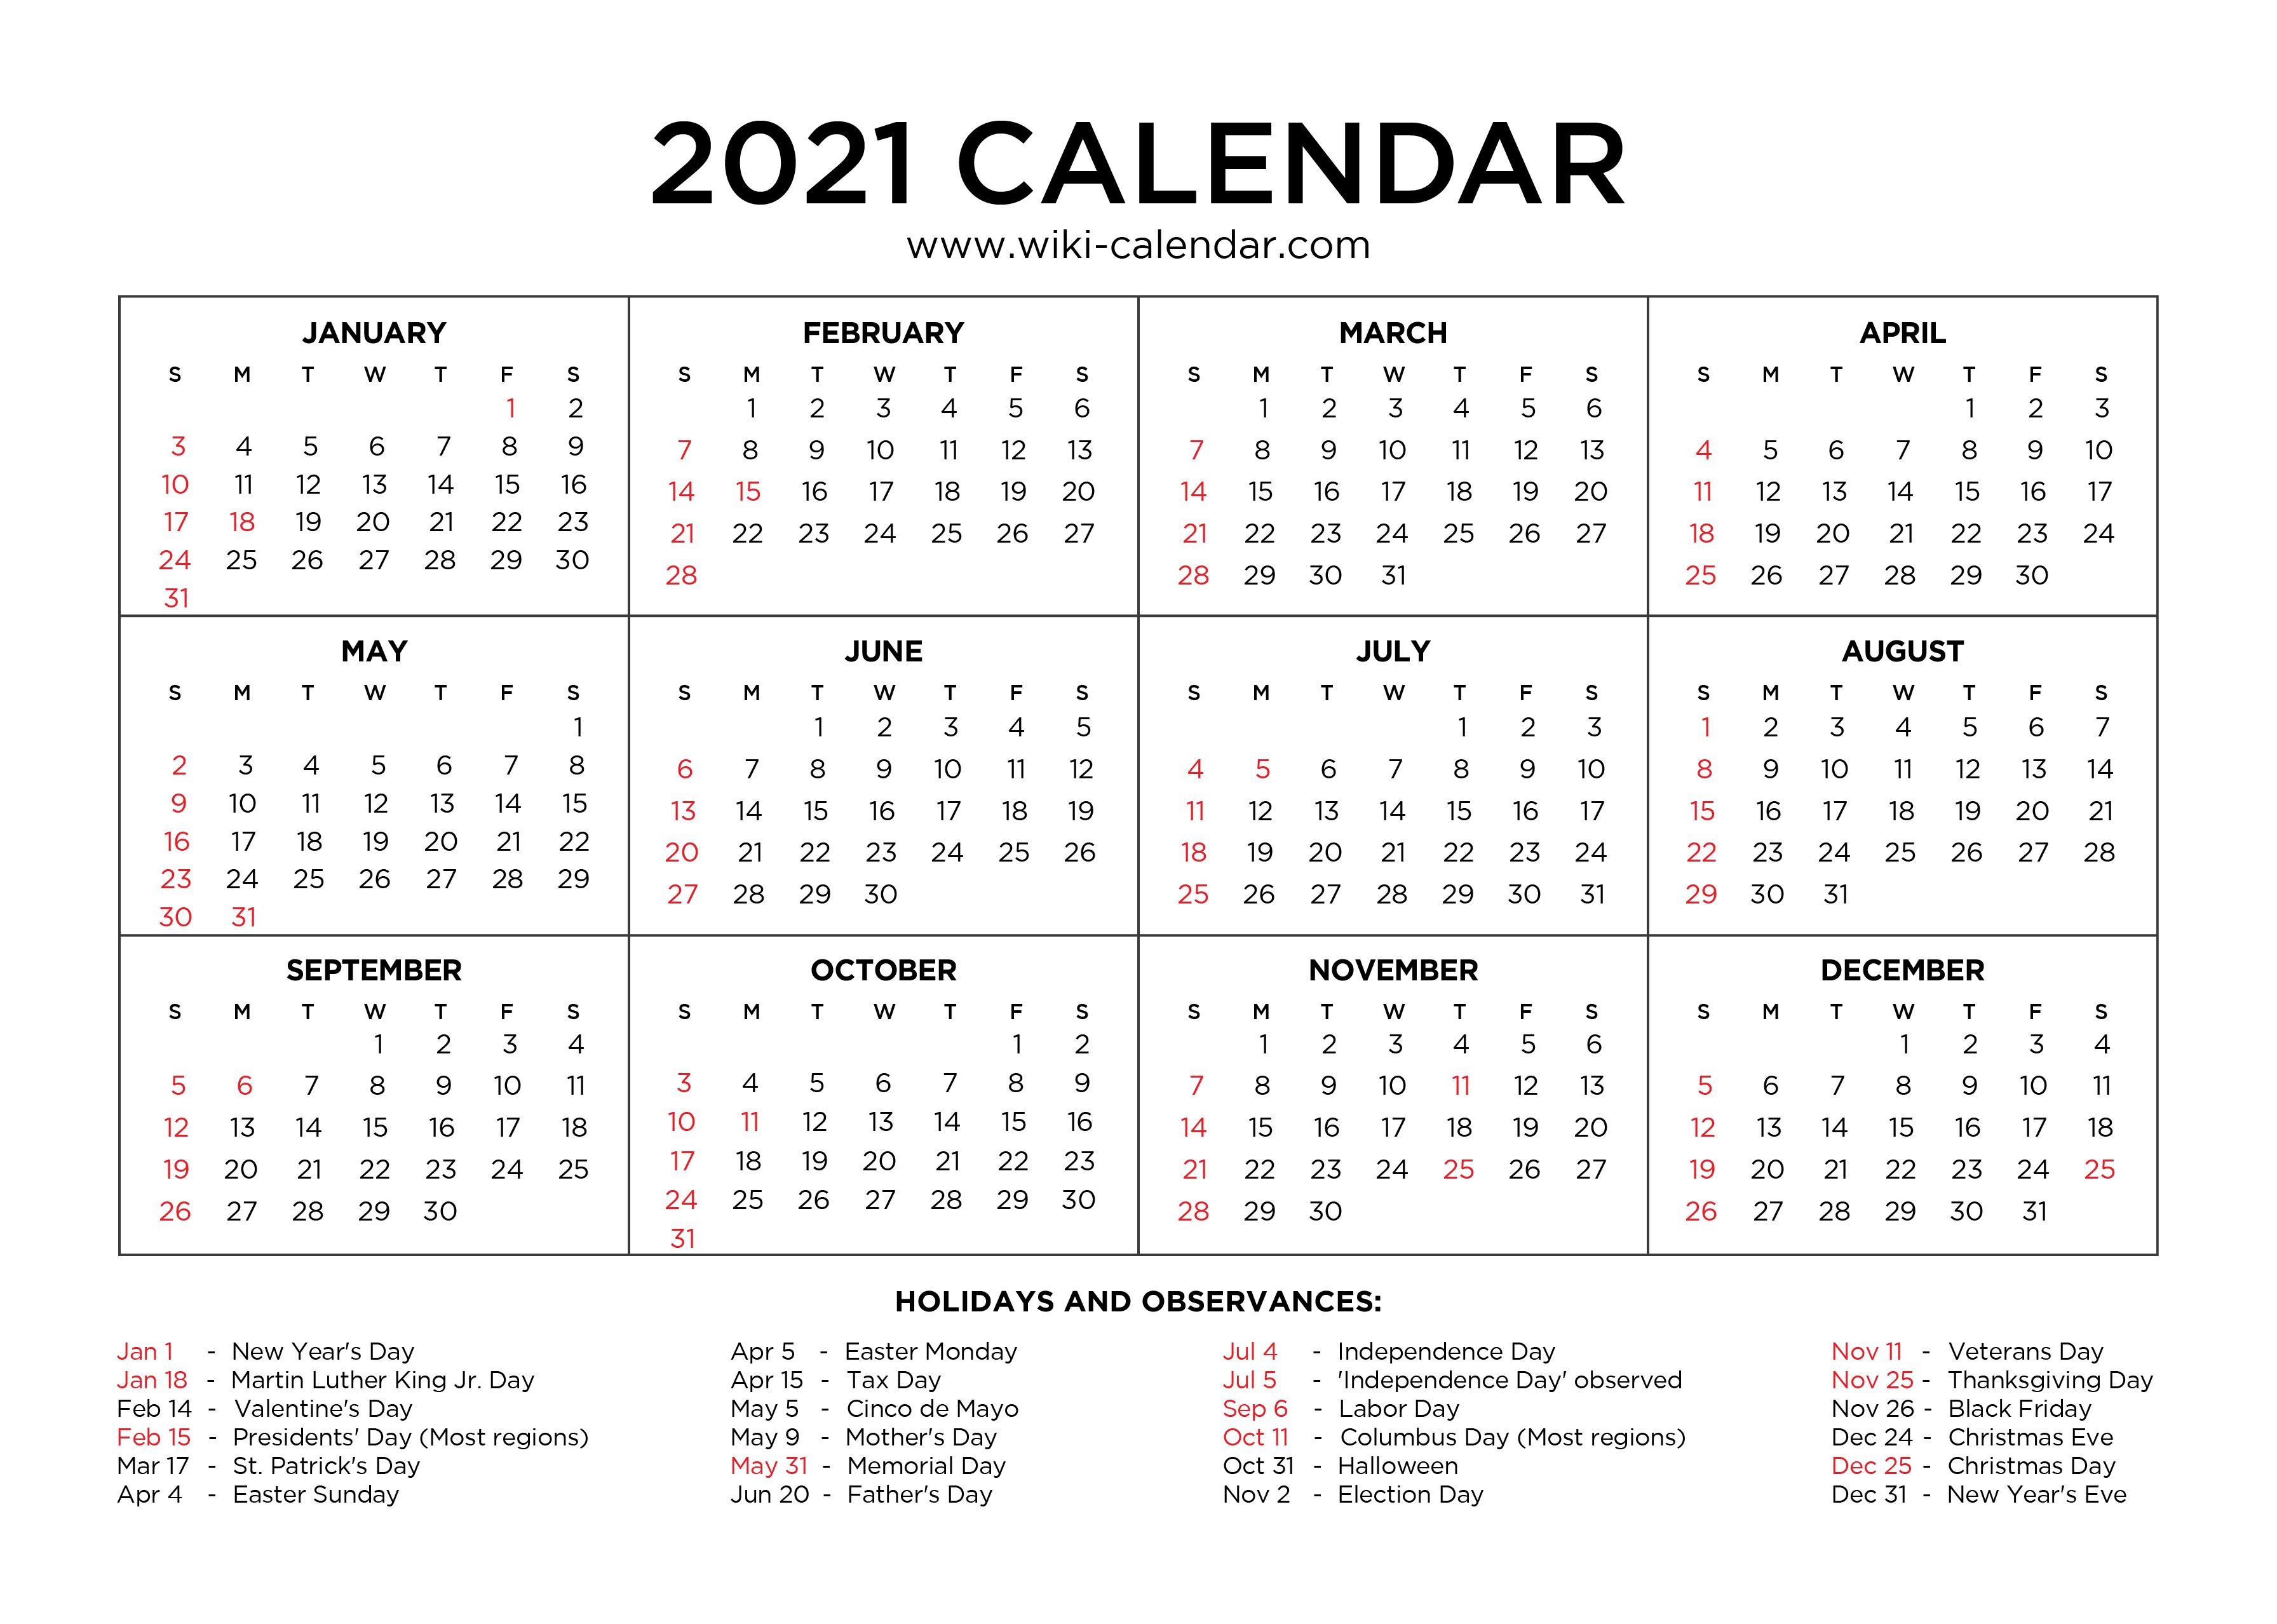 2021 Calendar Holidays